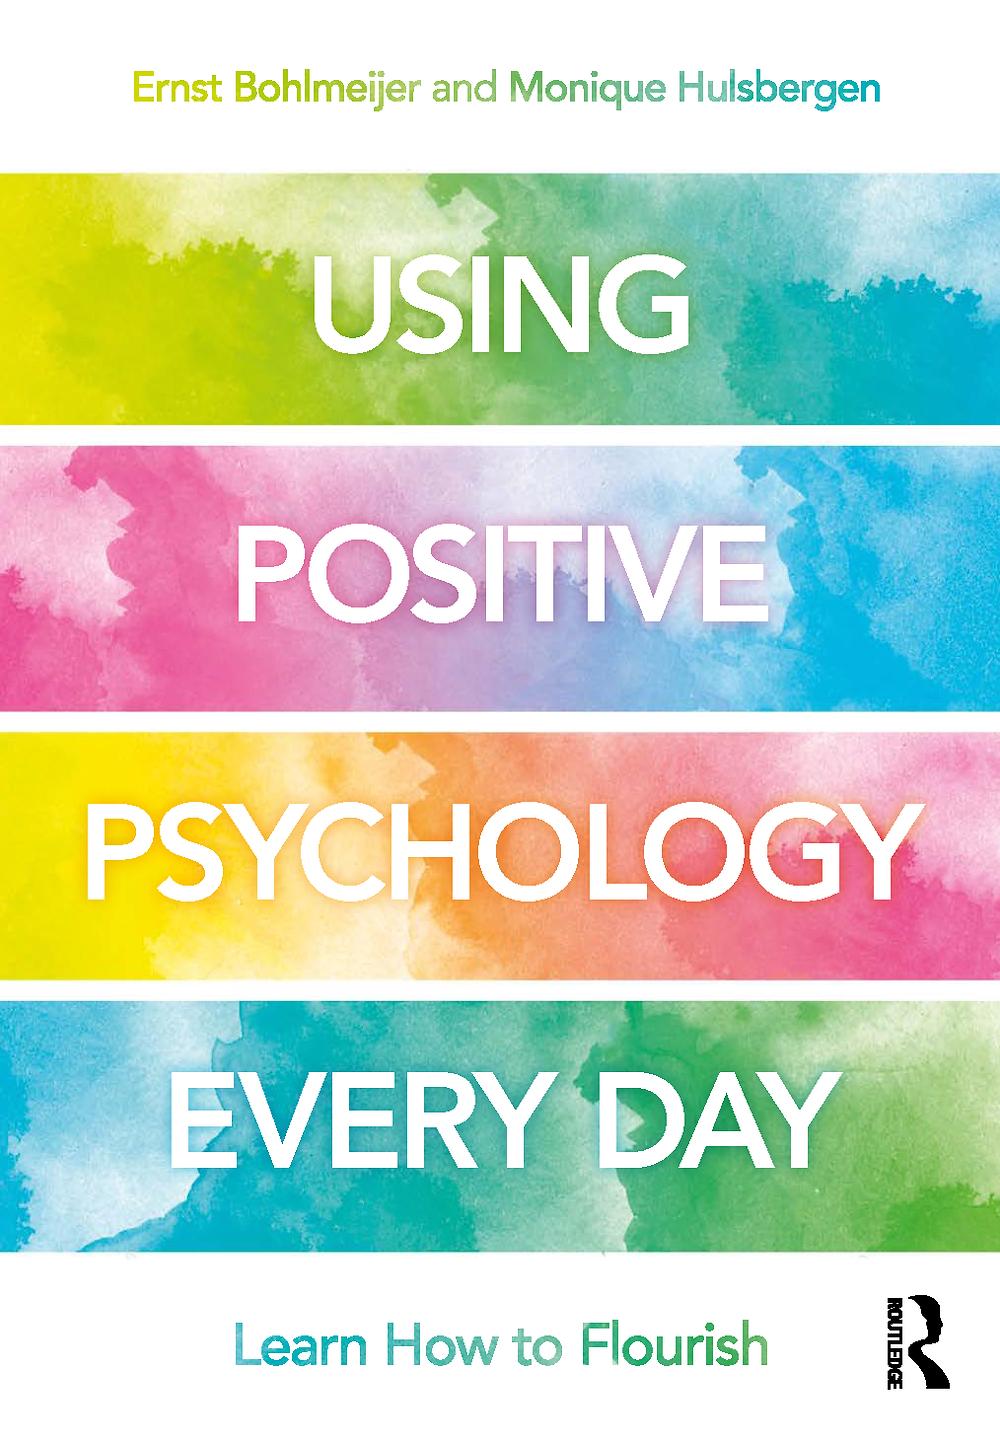 Using positive psychology every day, Ernst Bohlmeijer, Monique Hulsbergen